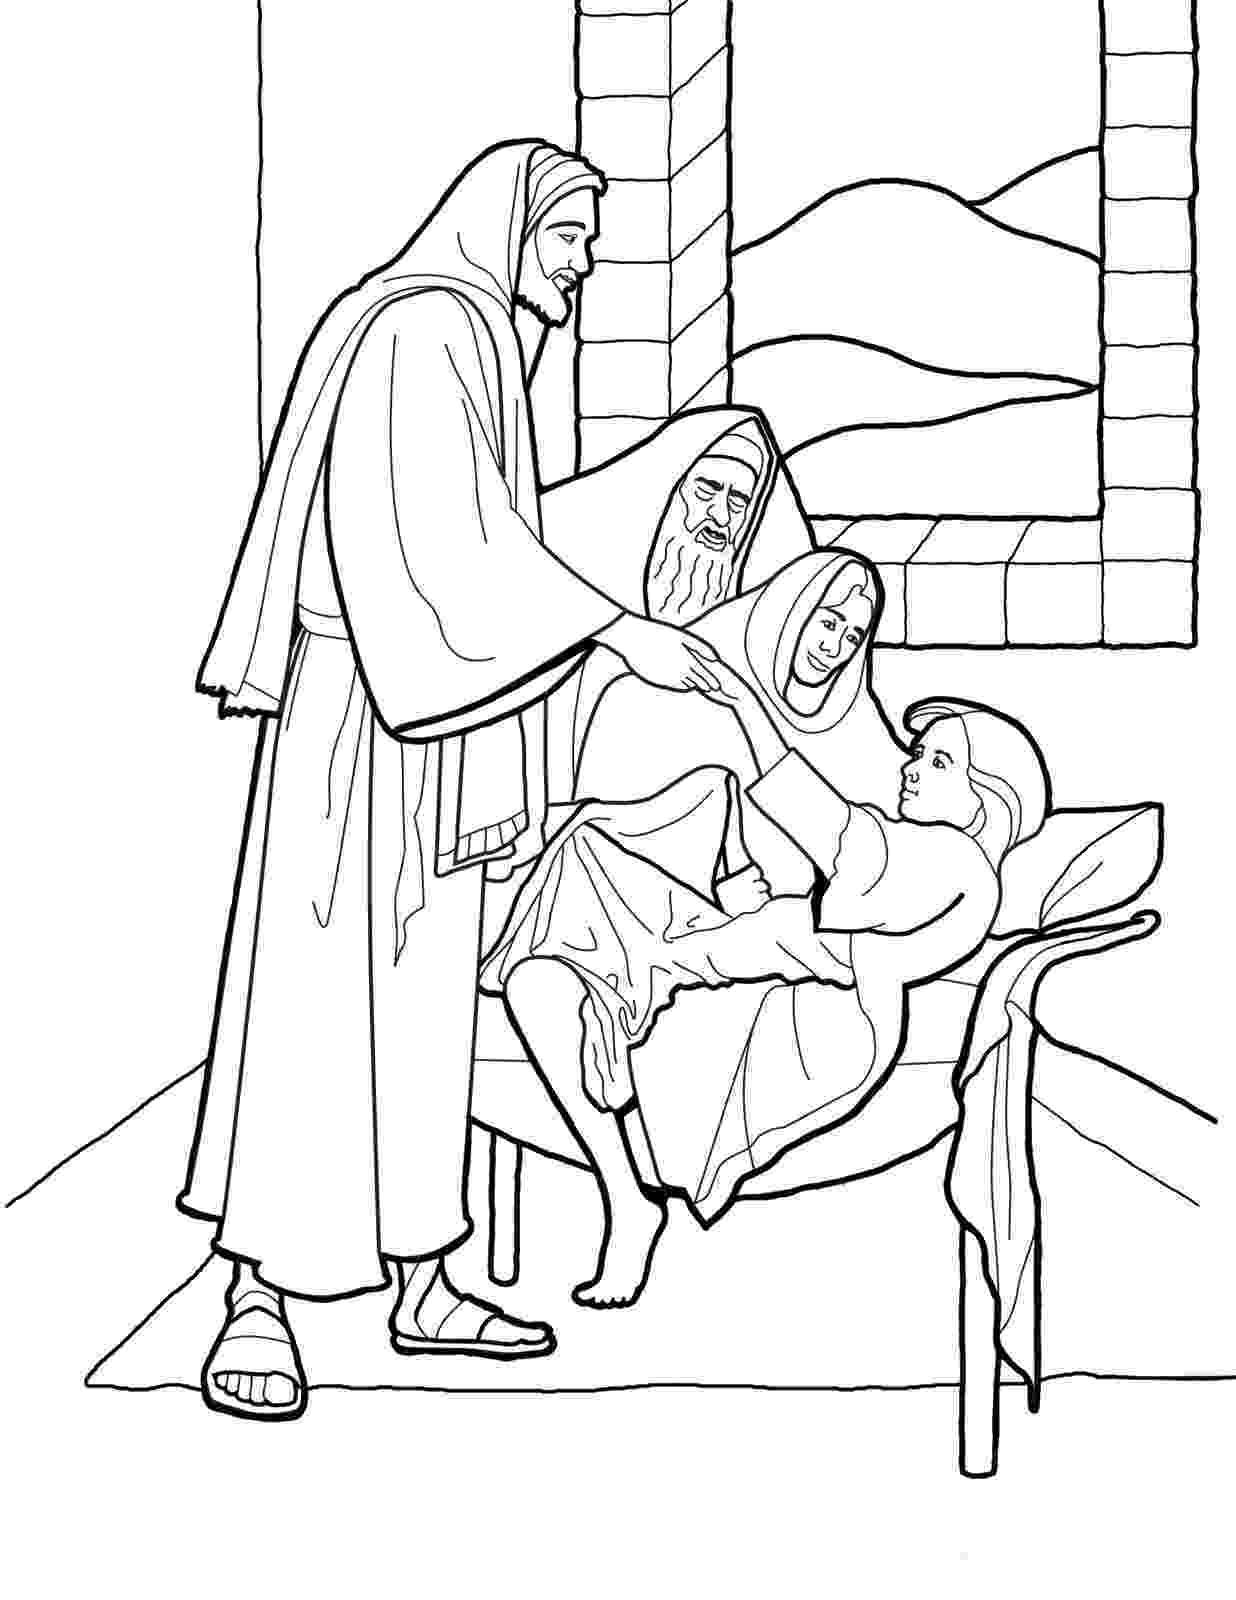 jairus daughter colouring sheets jesus restores jairus39 daughter to life coloring page colouring jairus daughter sheets